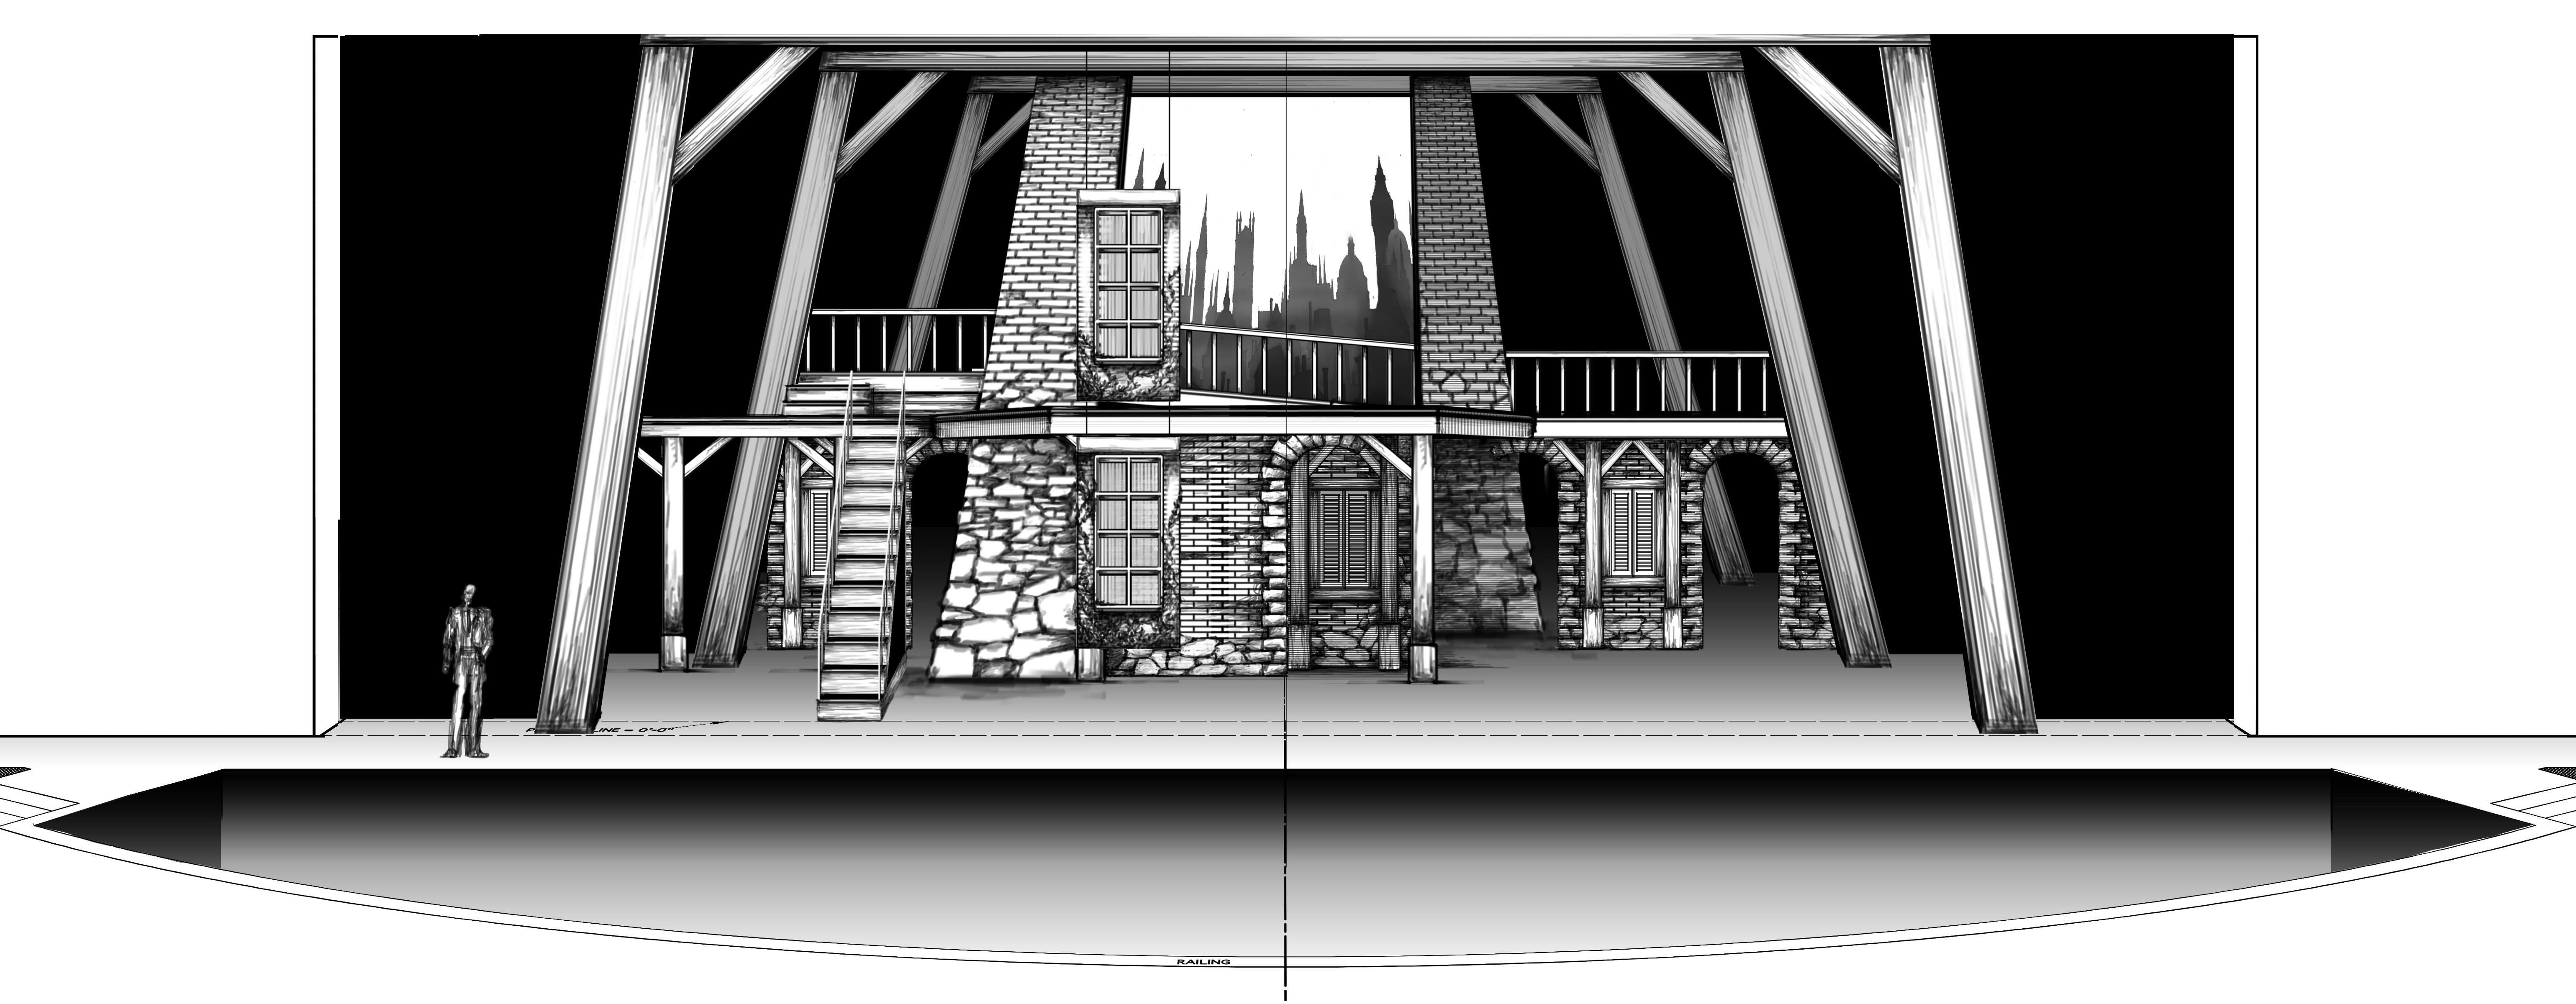 1.3- Judge's Mansion